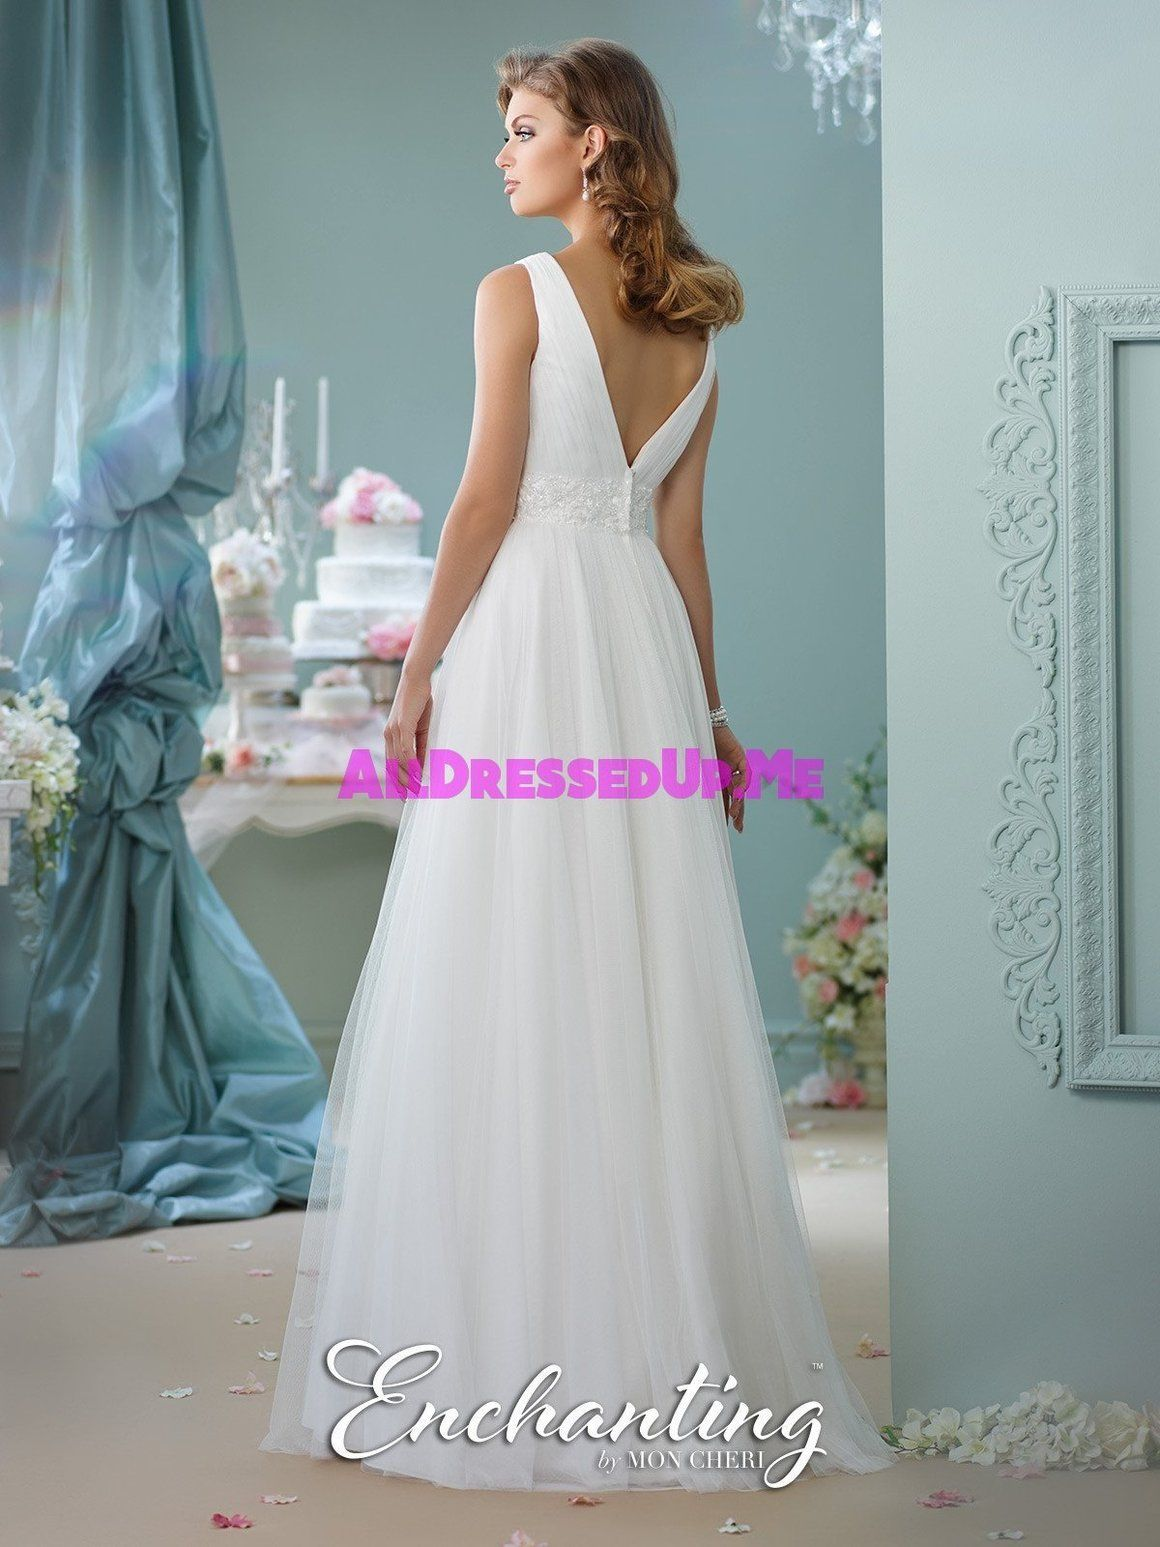 Dorable Bridal Gowns Sunshine Coast Inspiration - All Wedding ...